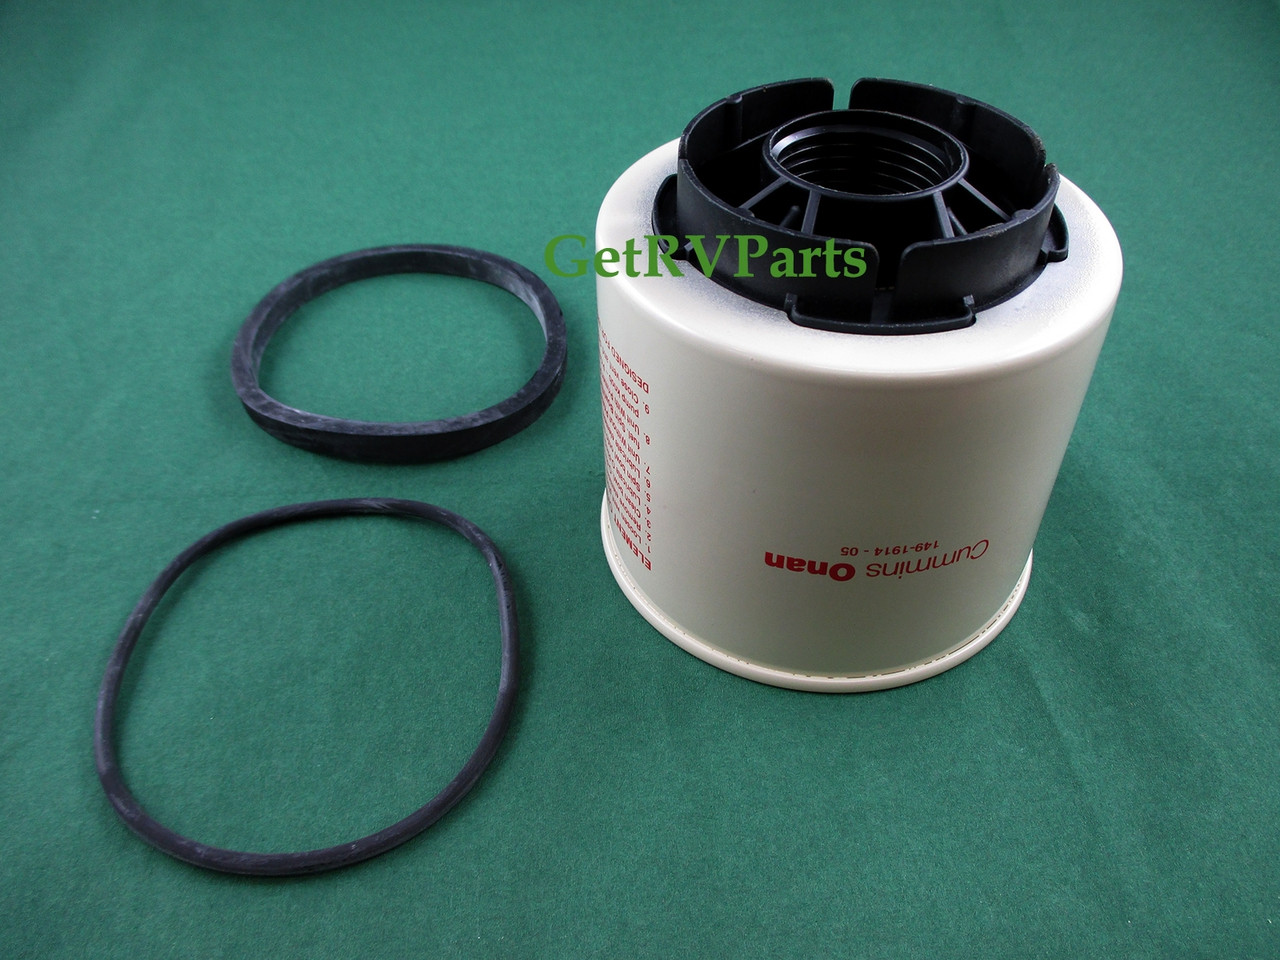 Onan Fuel Filter - Wiring Diagrams List Onan Generator Hdkbb Wiring Schematic on